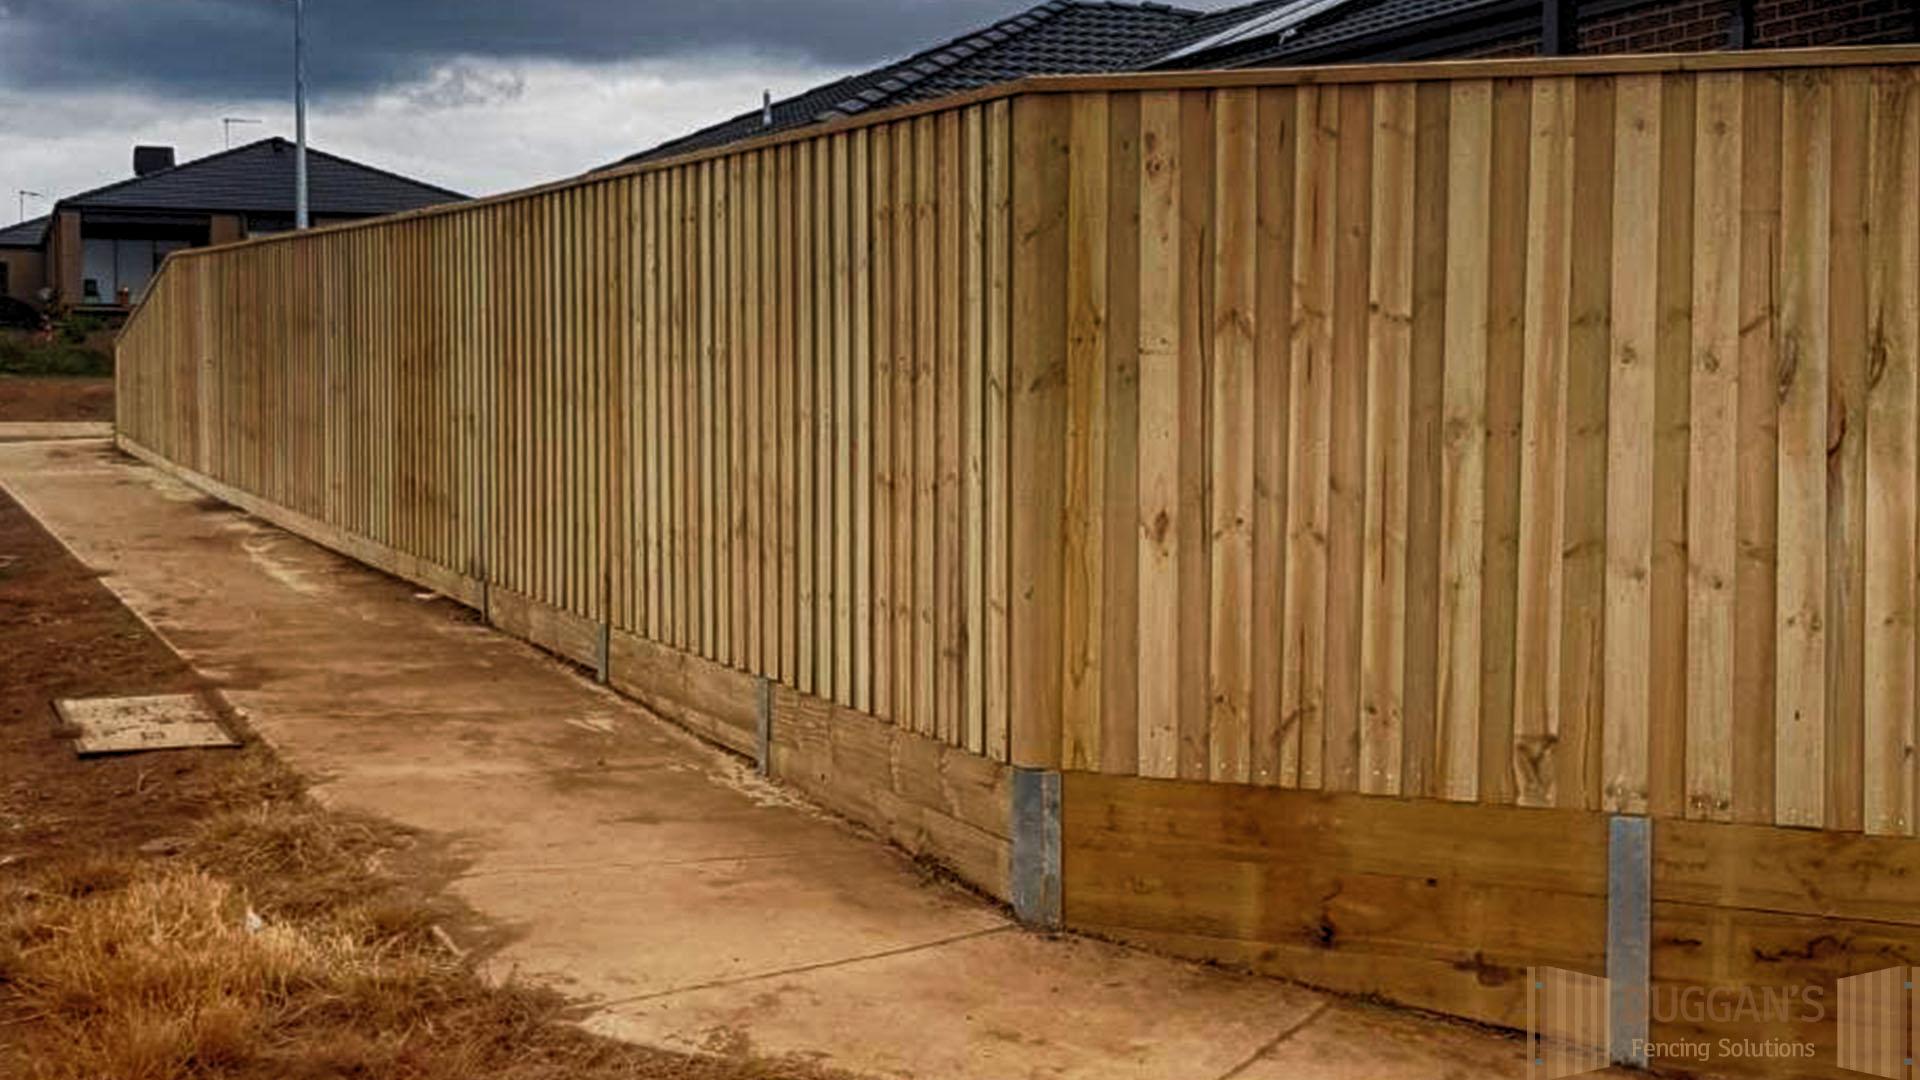 Timber on retaining wall 2.jpg